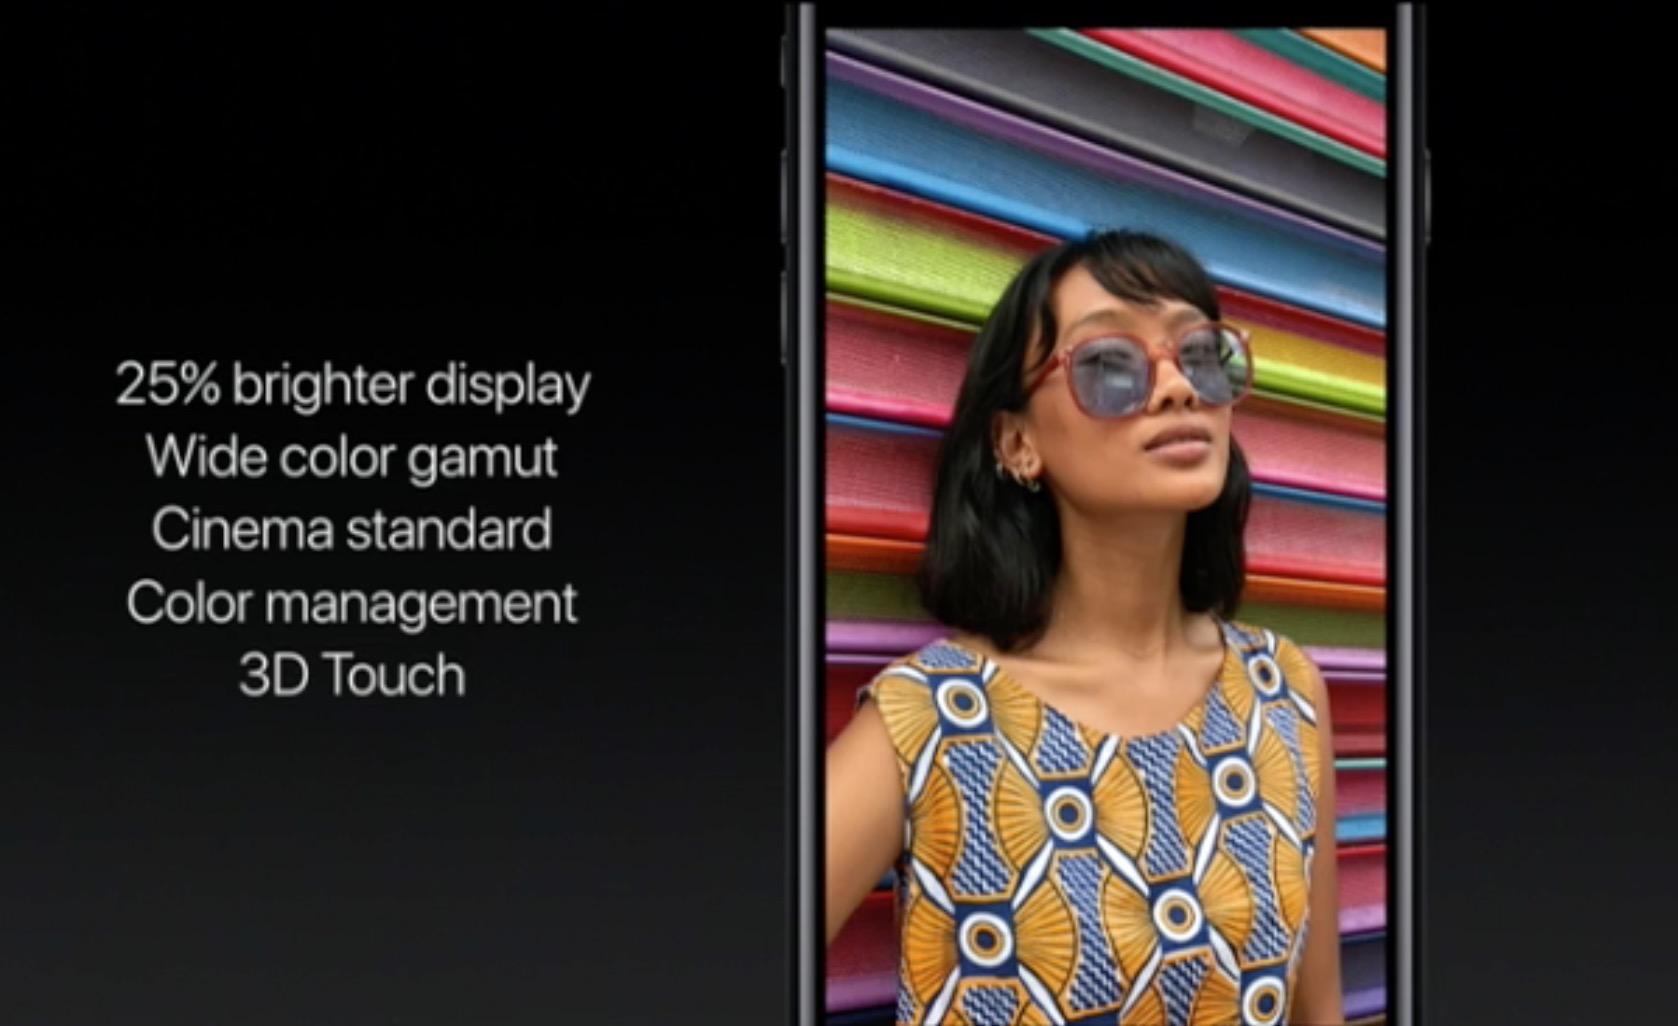 Retina HD display